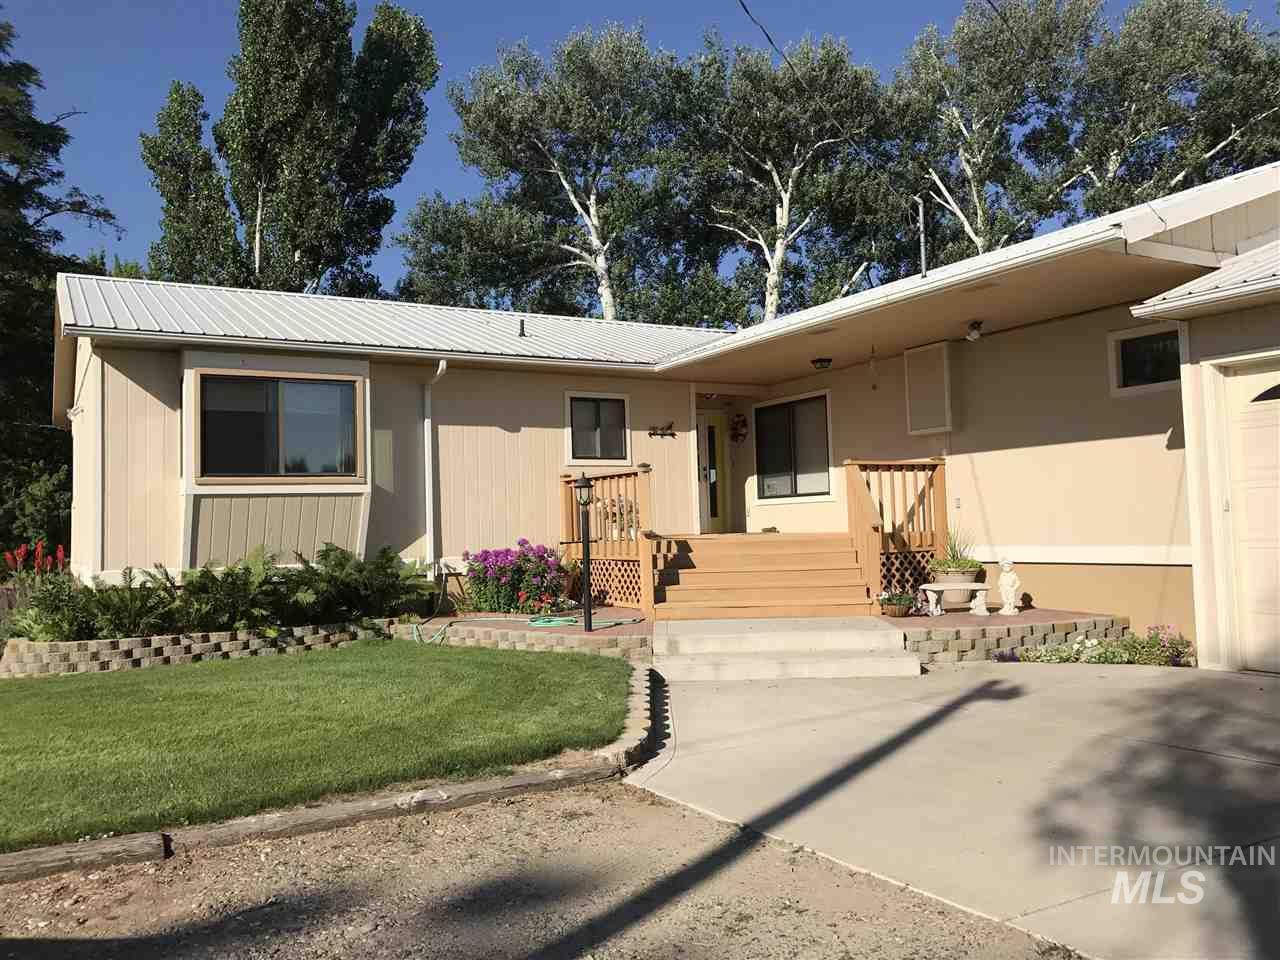 Single Family Home for Sale at 1925 S 2000 E 1925 S 2000 E Gooding, Idaho 83330